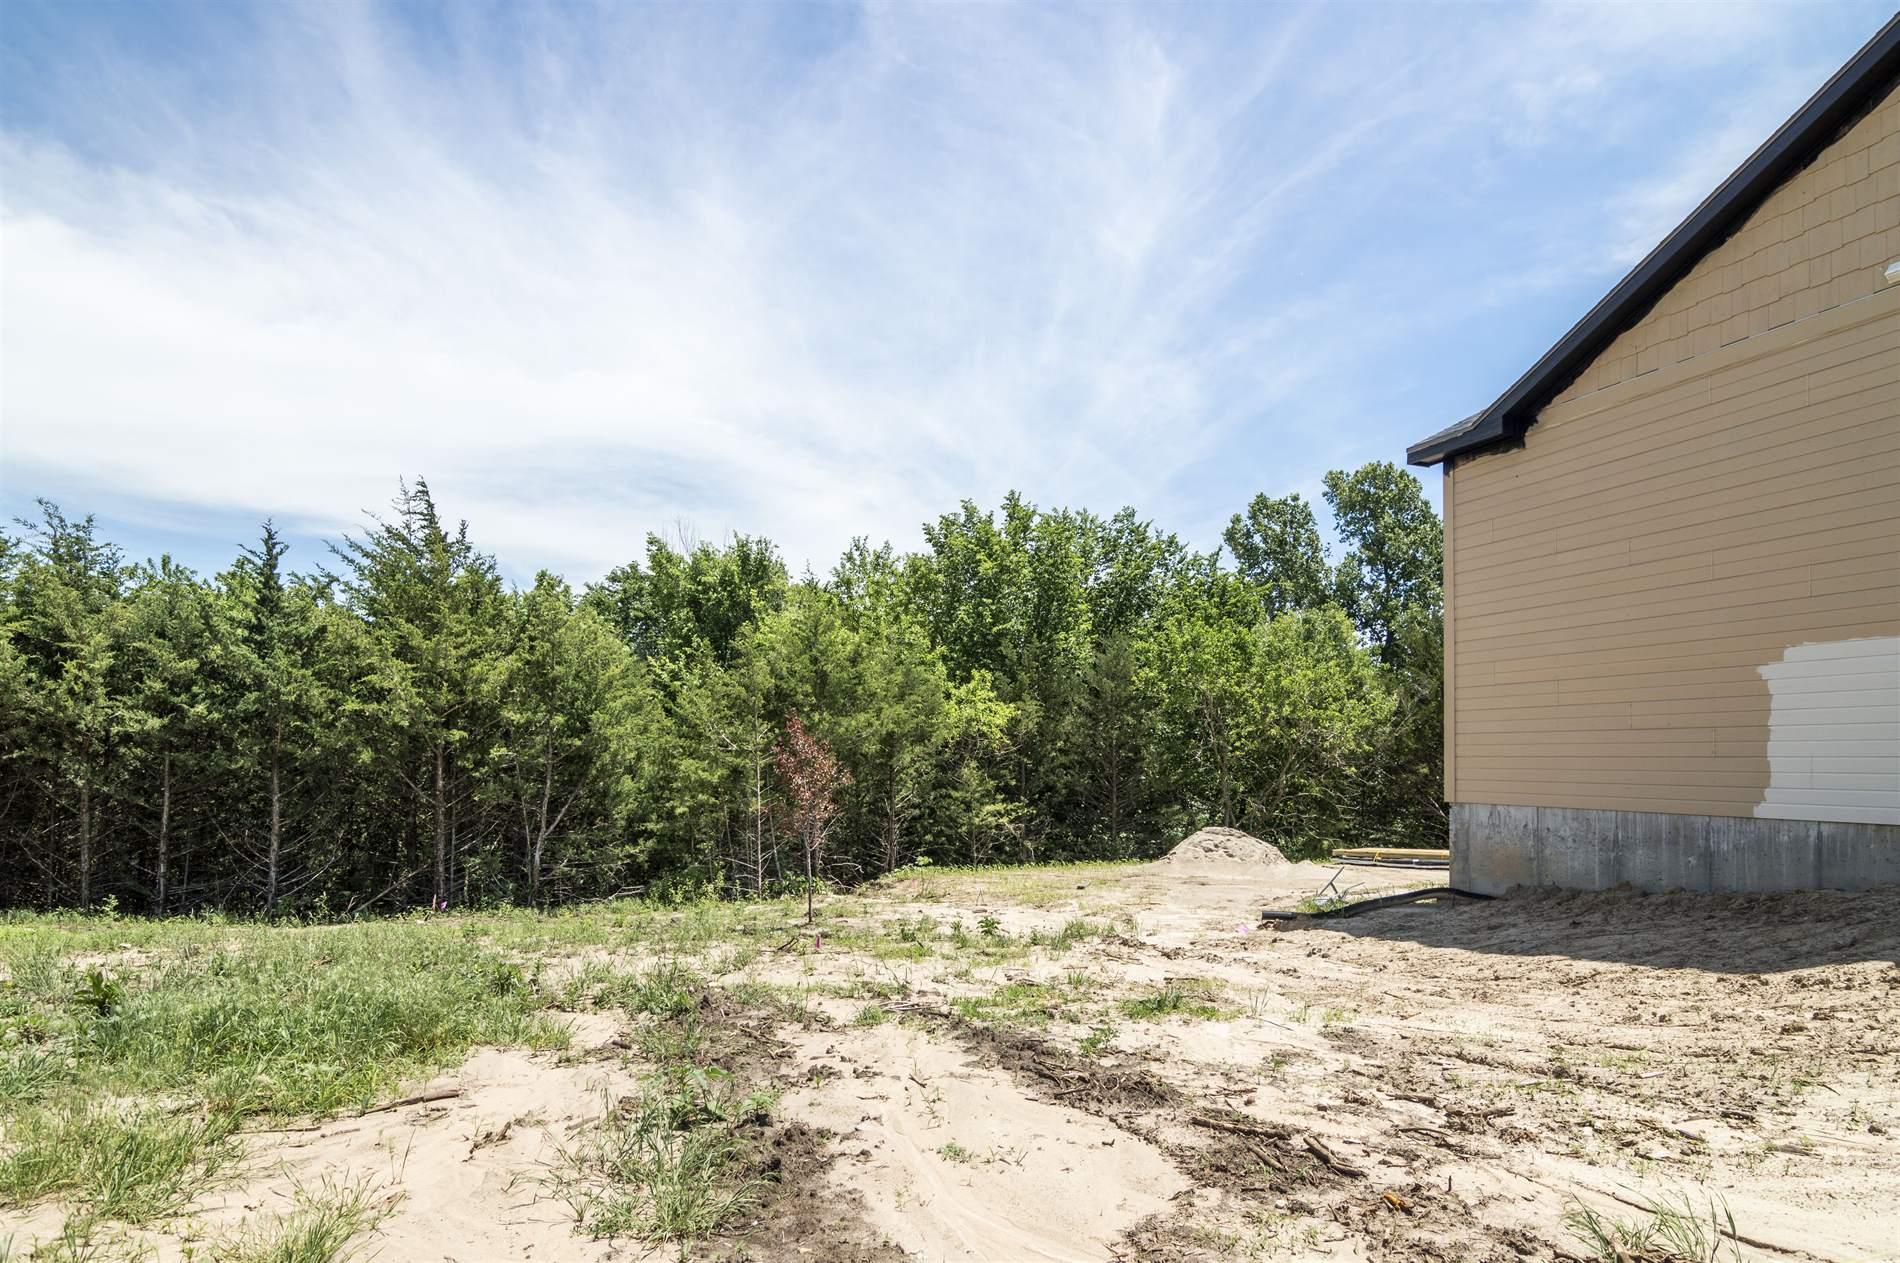 1007 Chisholm Trail, Junction City, KS 66441